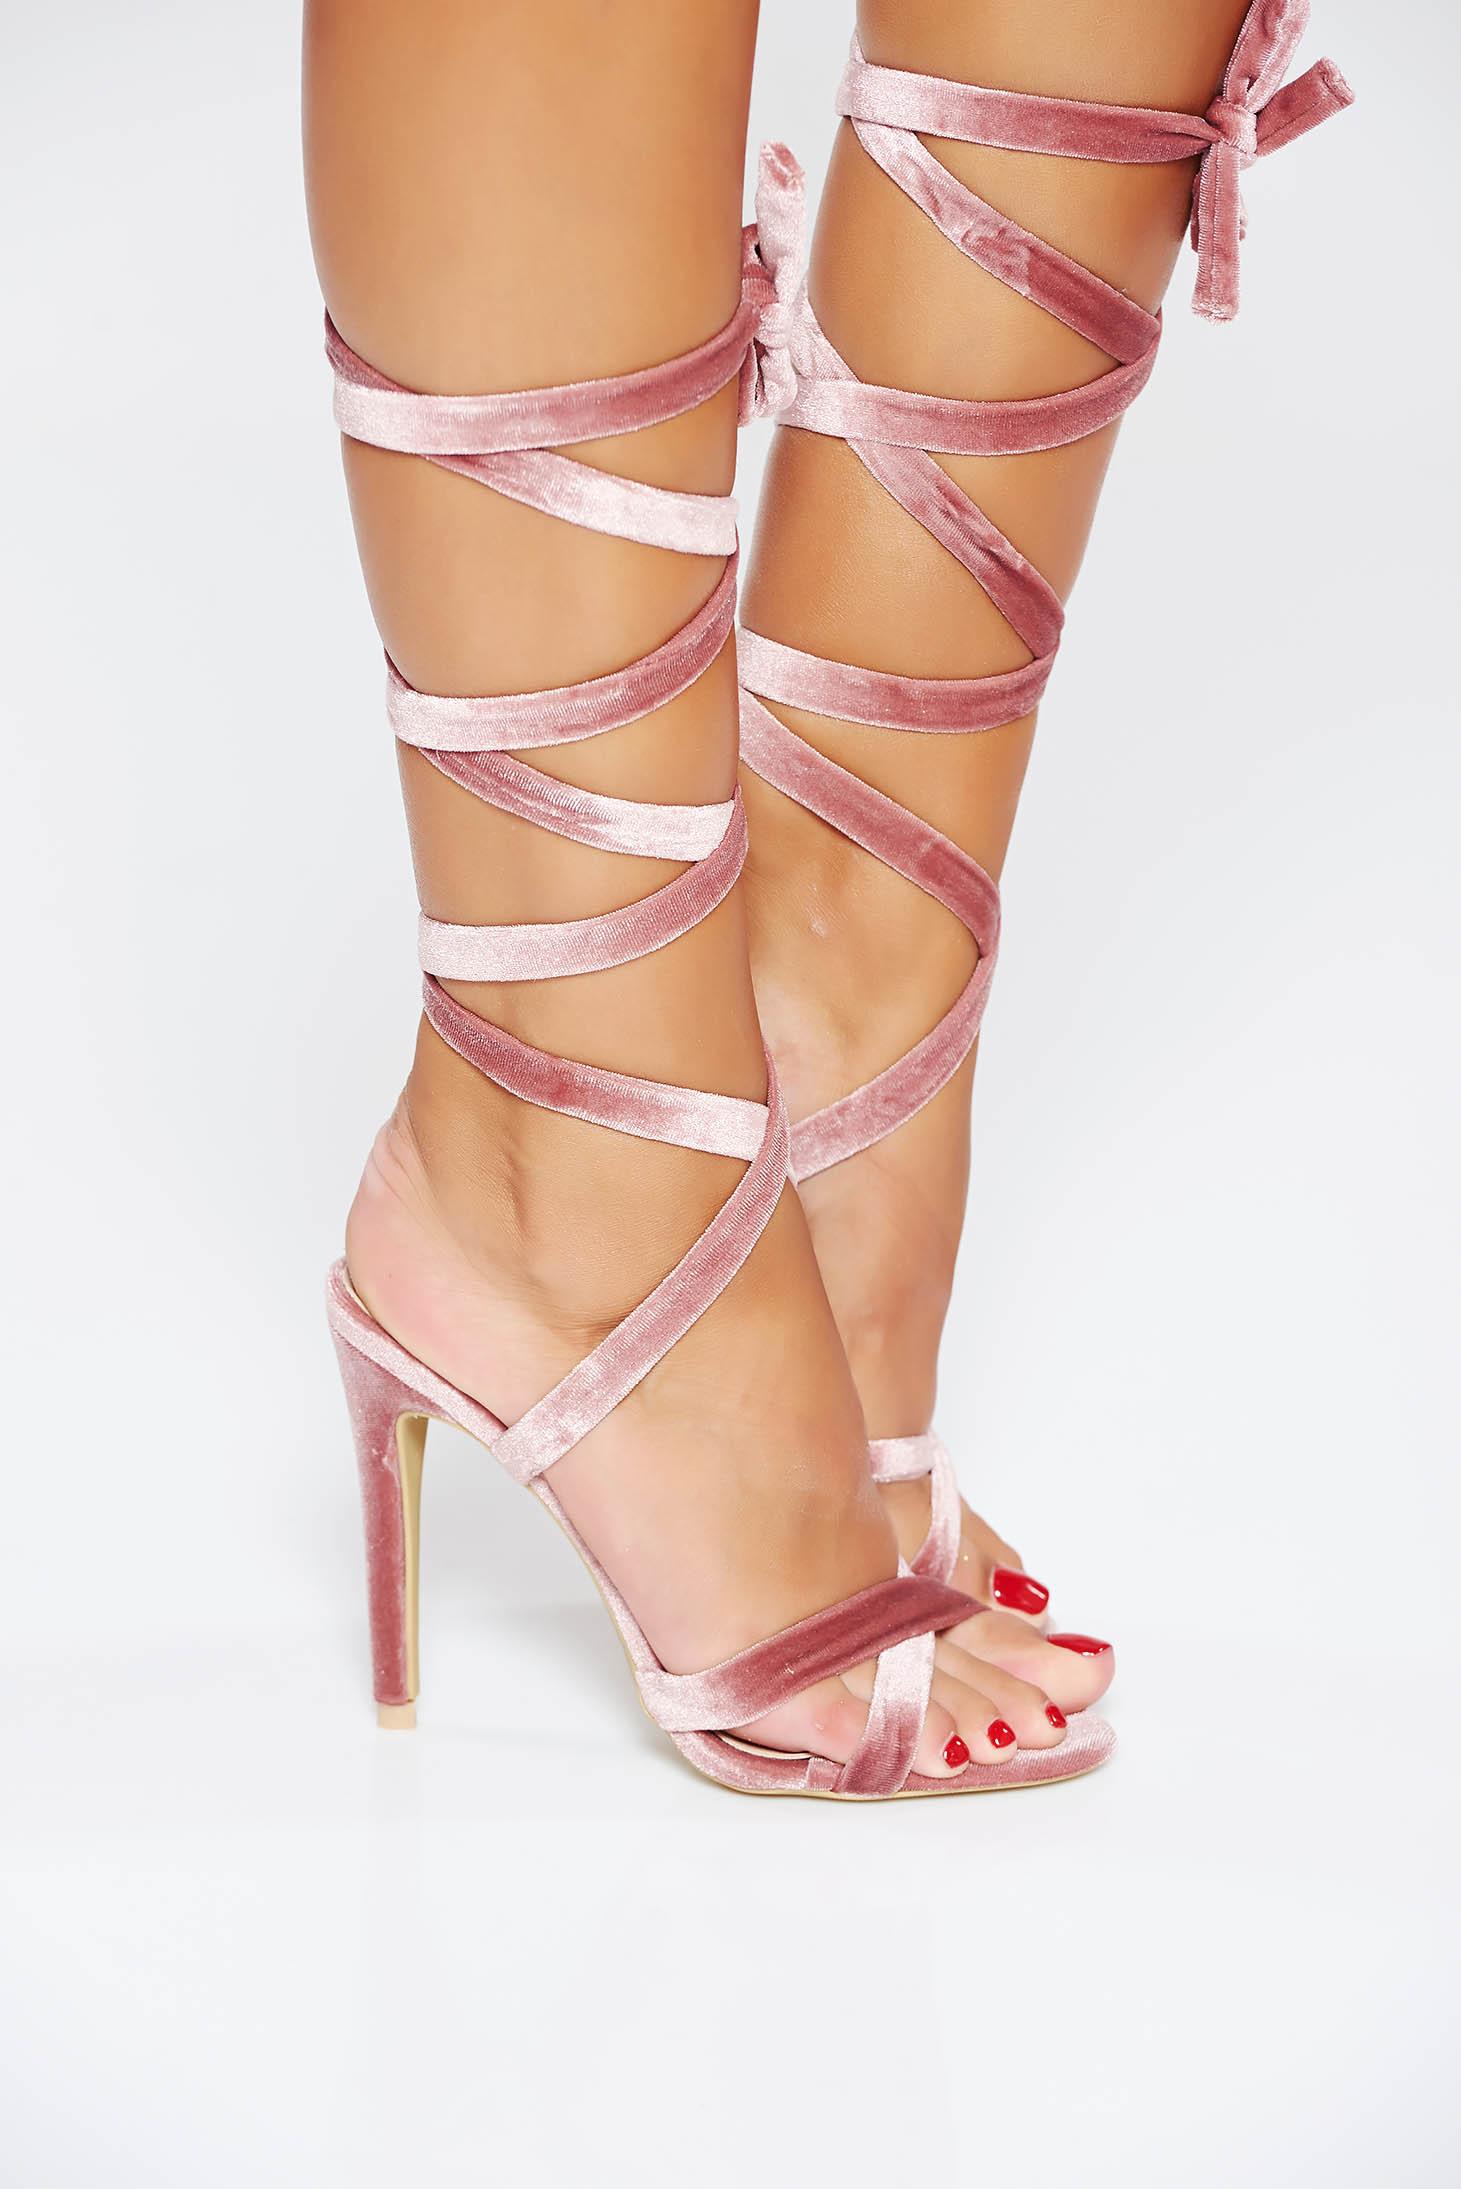 Sandale roz de ocazie cu barete subtiri